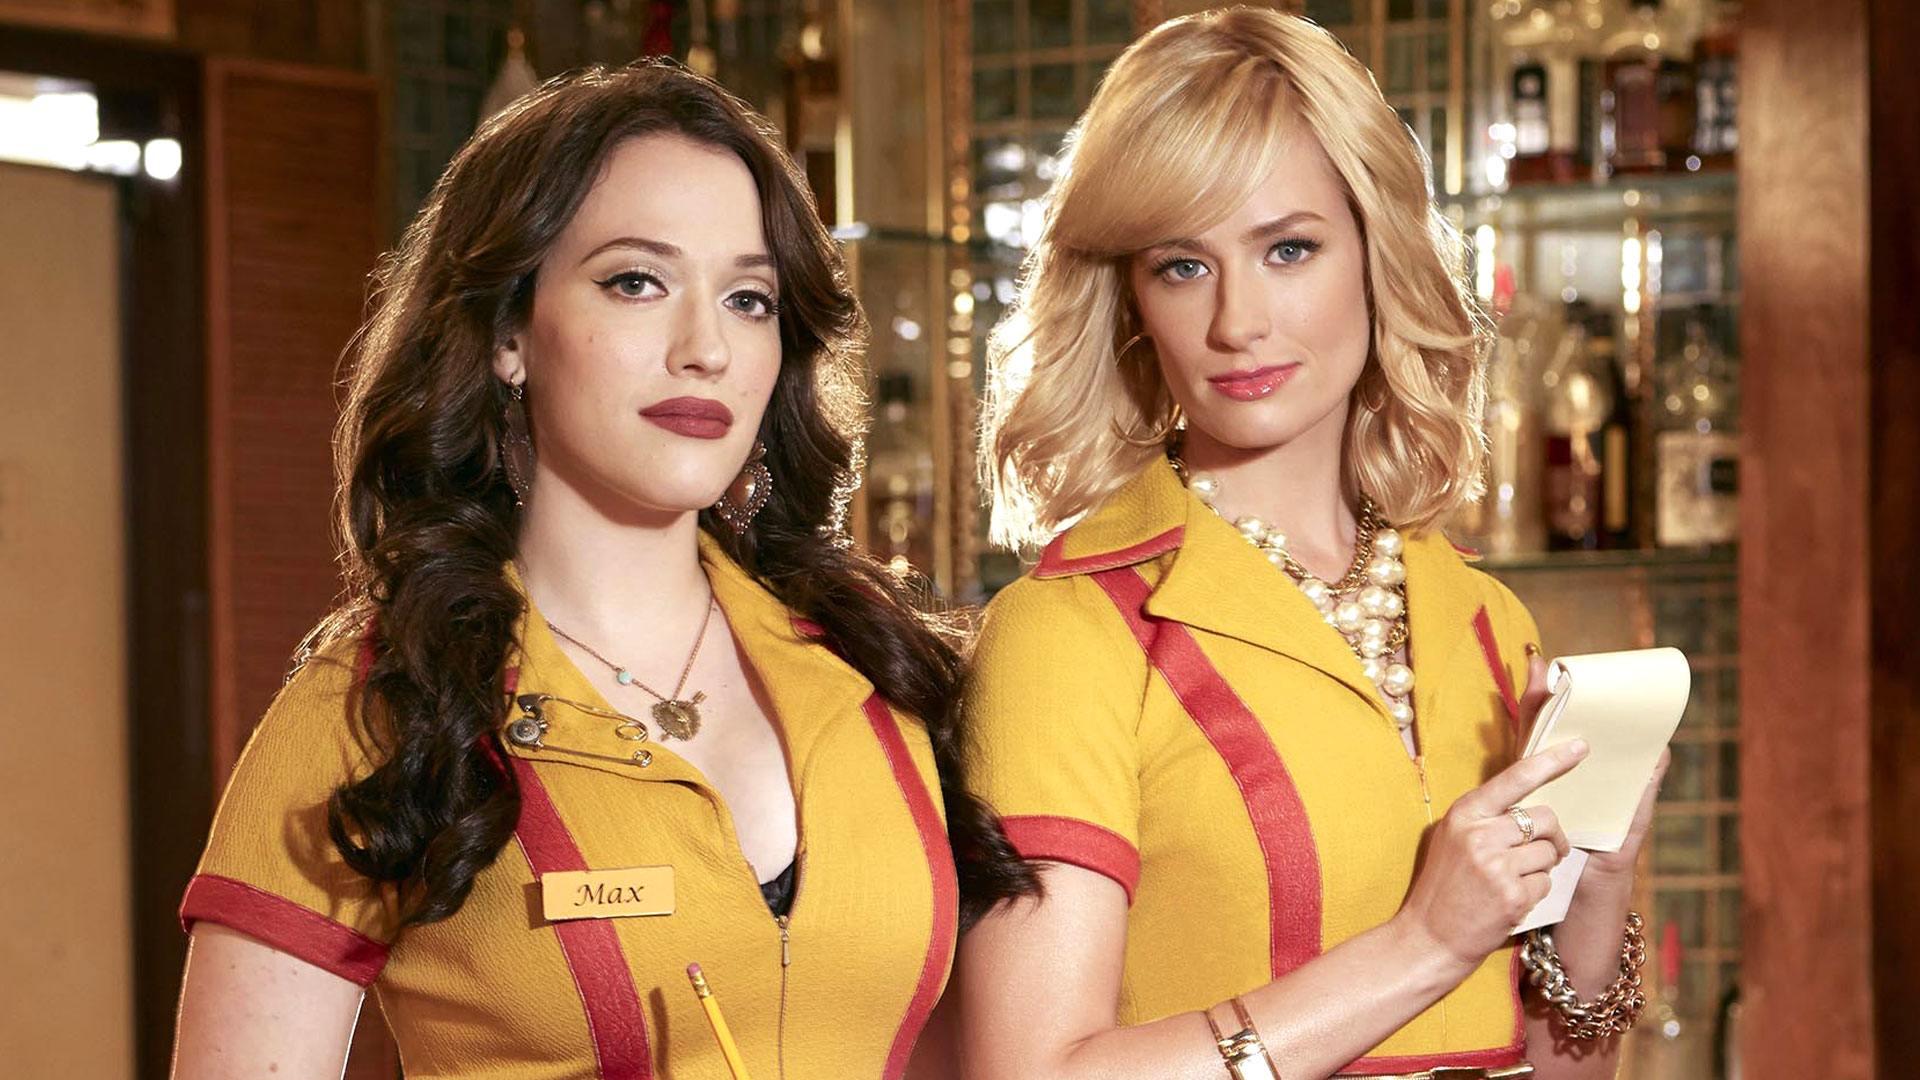 Kat Dennigs and Beth Behrs wear waitress uniforms in 2 Broke Girls